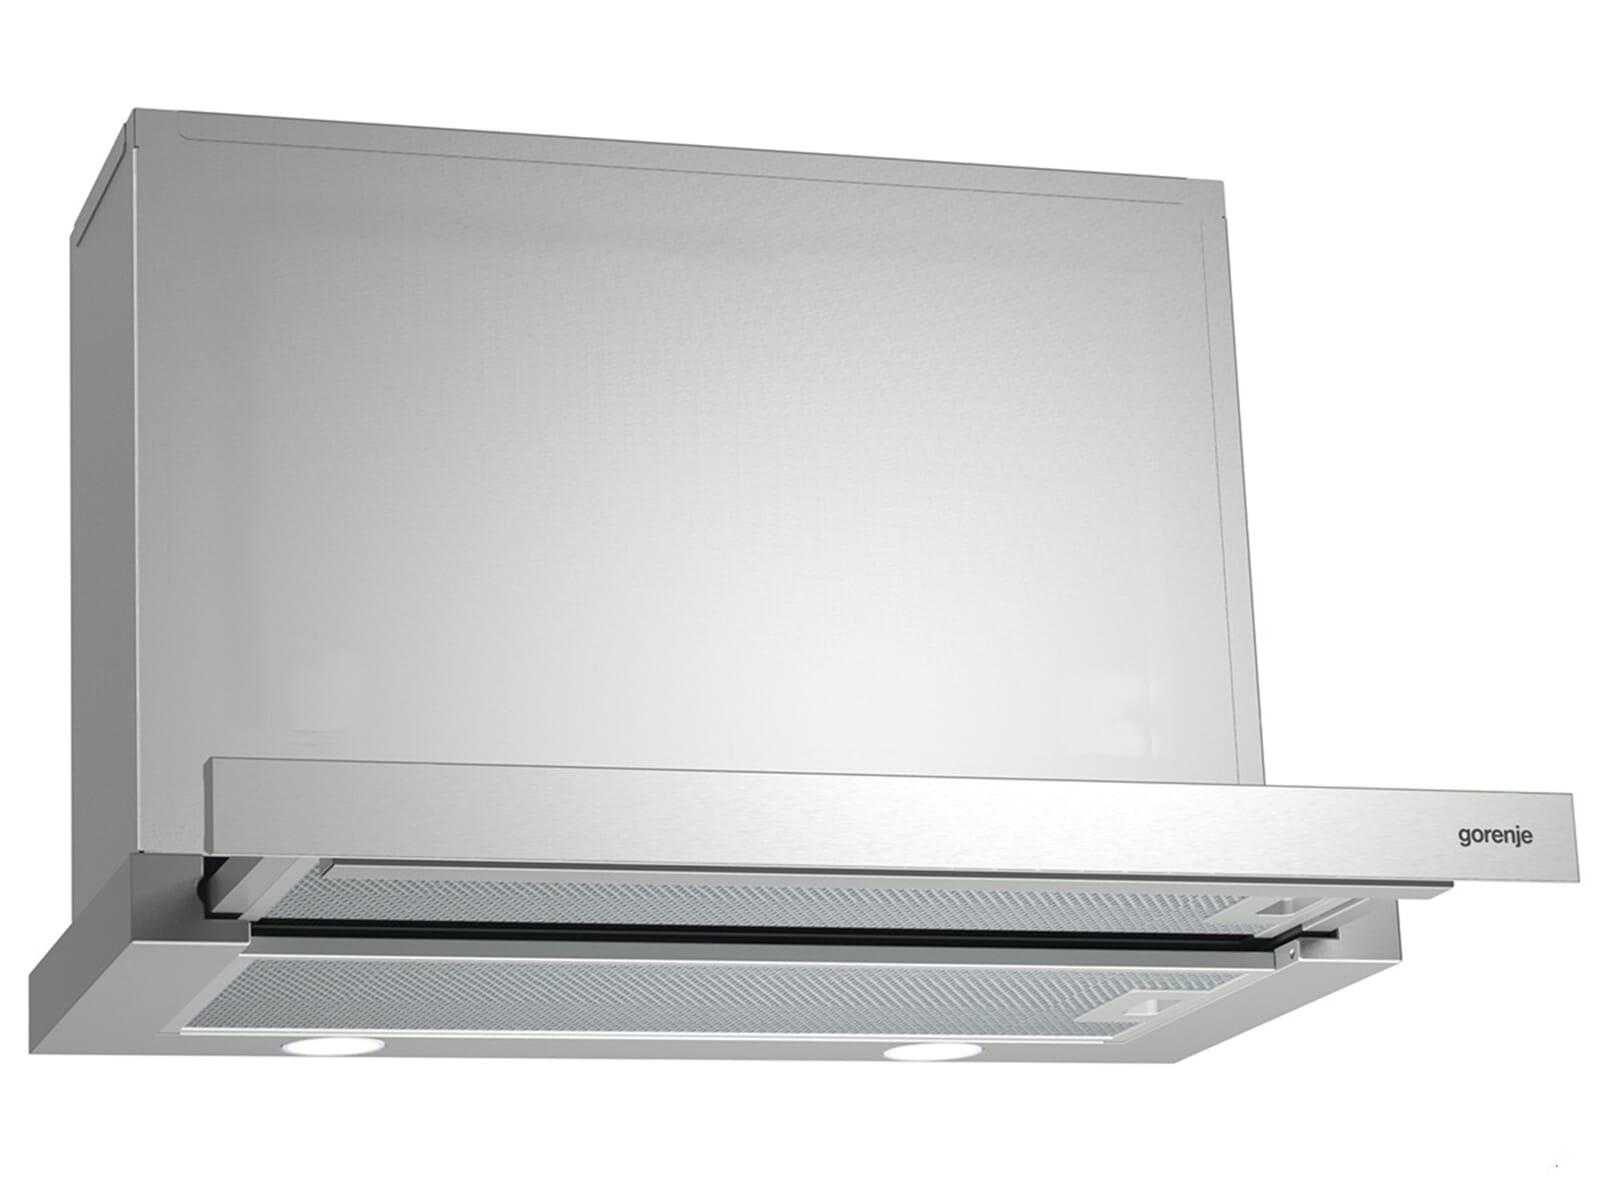 gorenje bhp 613 e7x flachschirm dunstabzugshaube edelstahl f r 138 90 eur. Black Bedroom Furniture Sets. Home Design Ideas